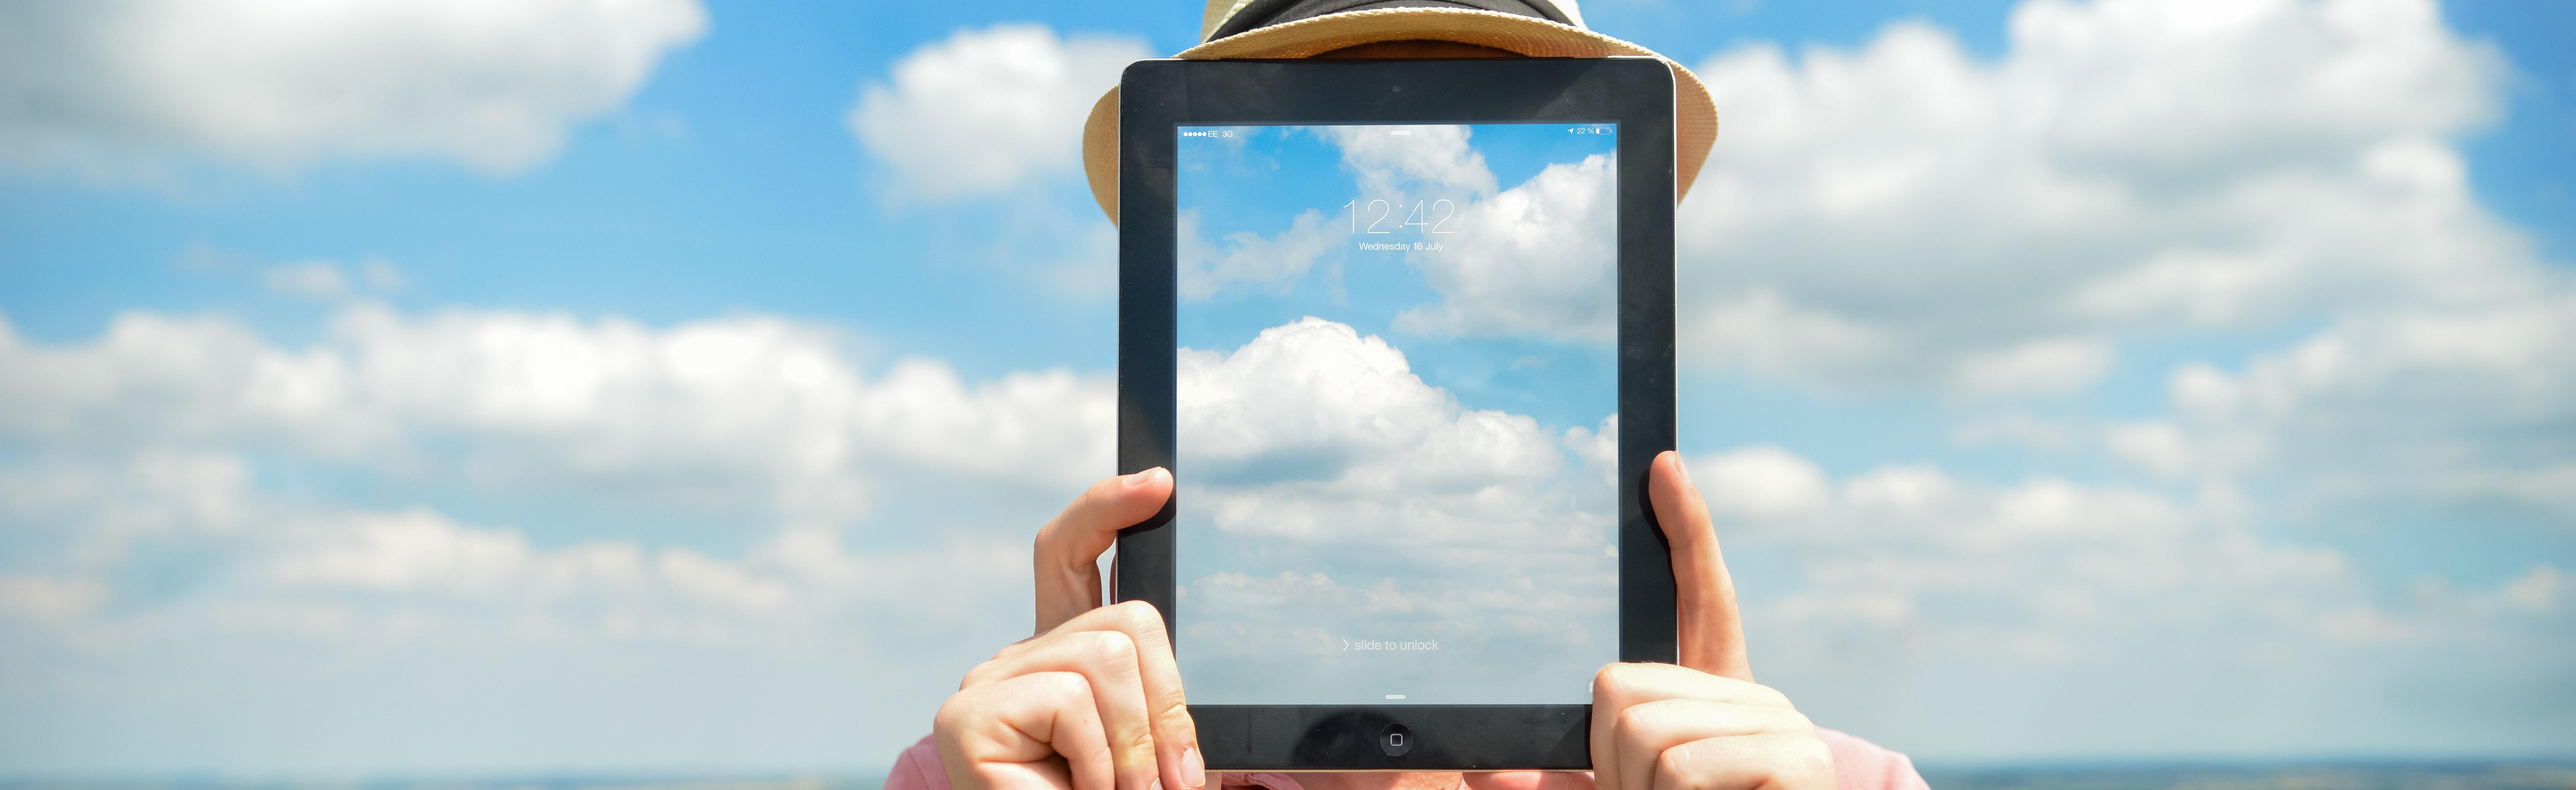 man-person-clouds-apple-1.jpg